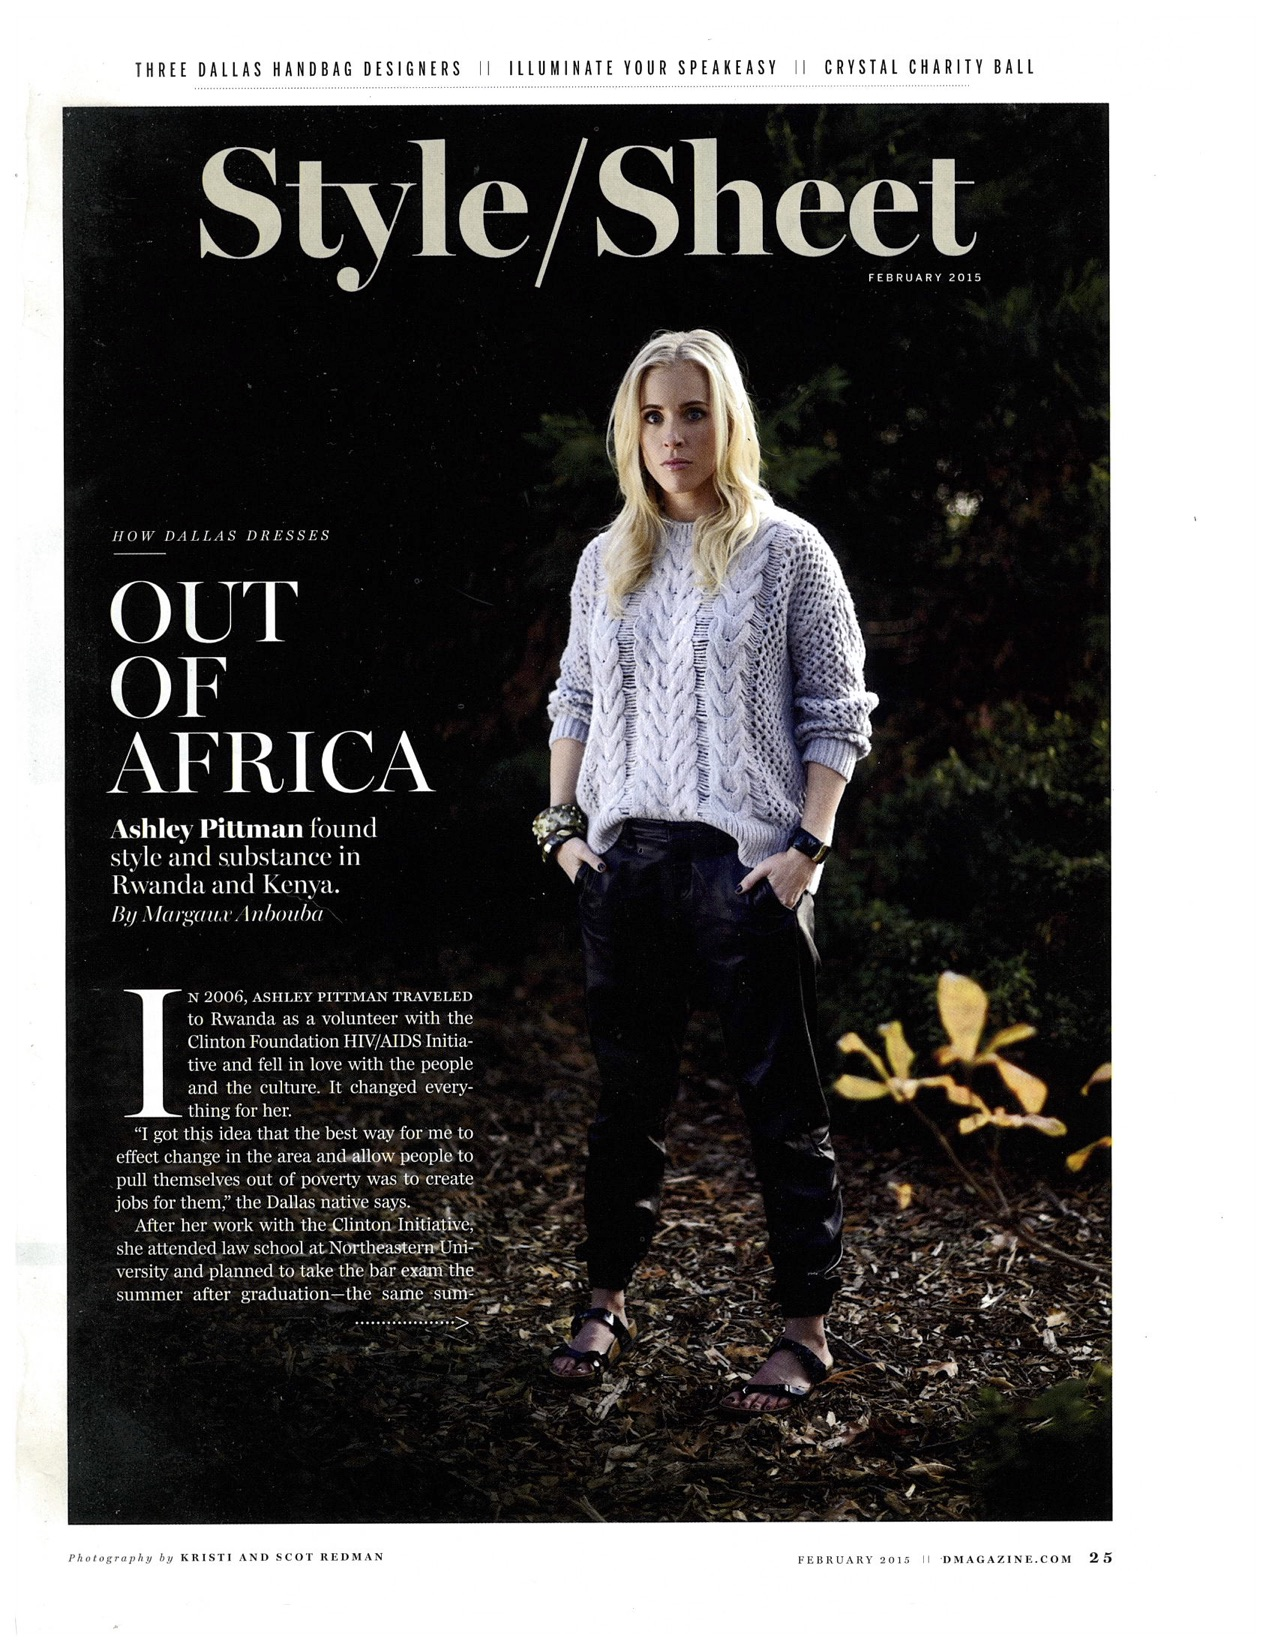 Ashley_Pittman_D_Magazine_Jpeg.jpg